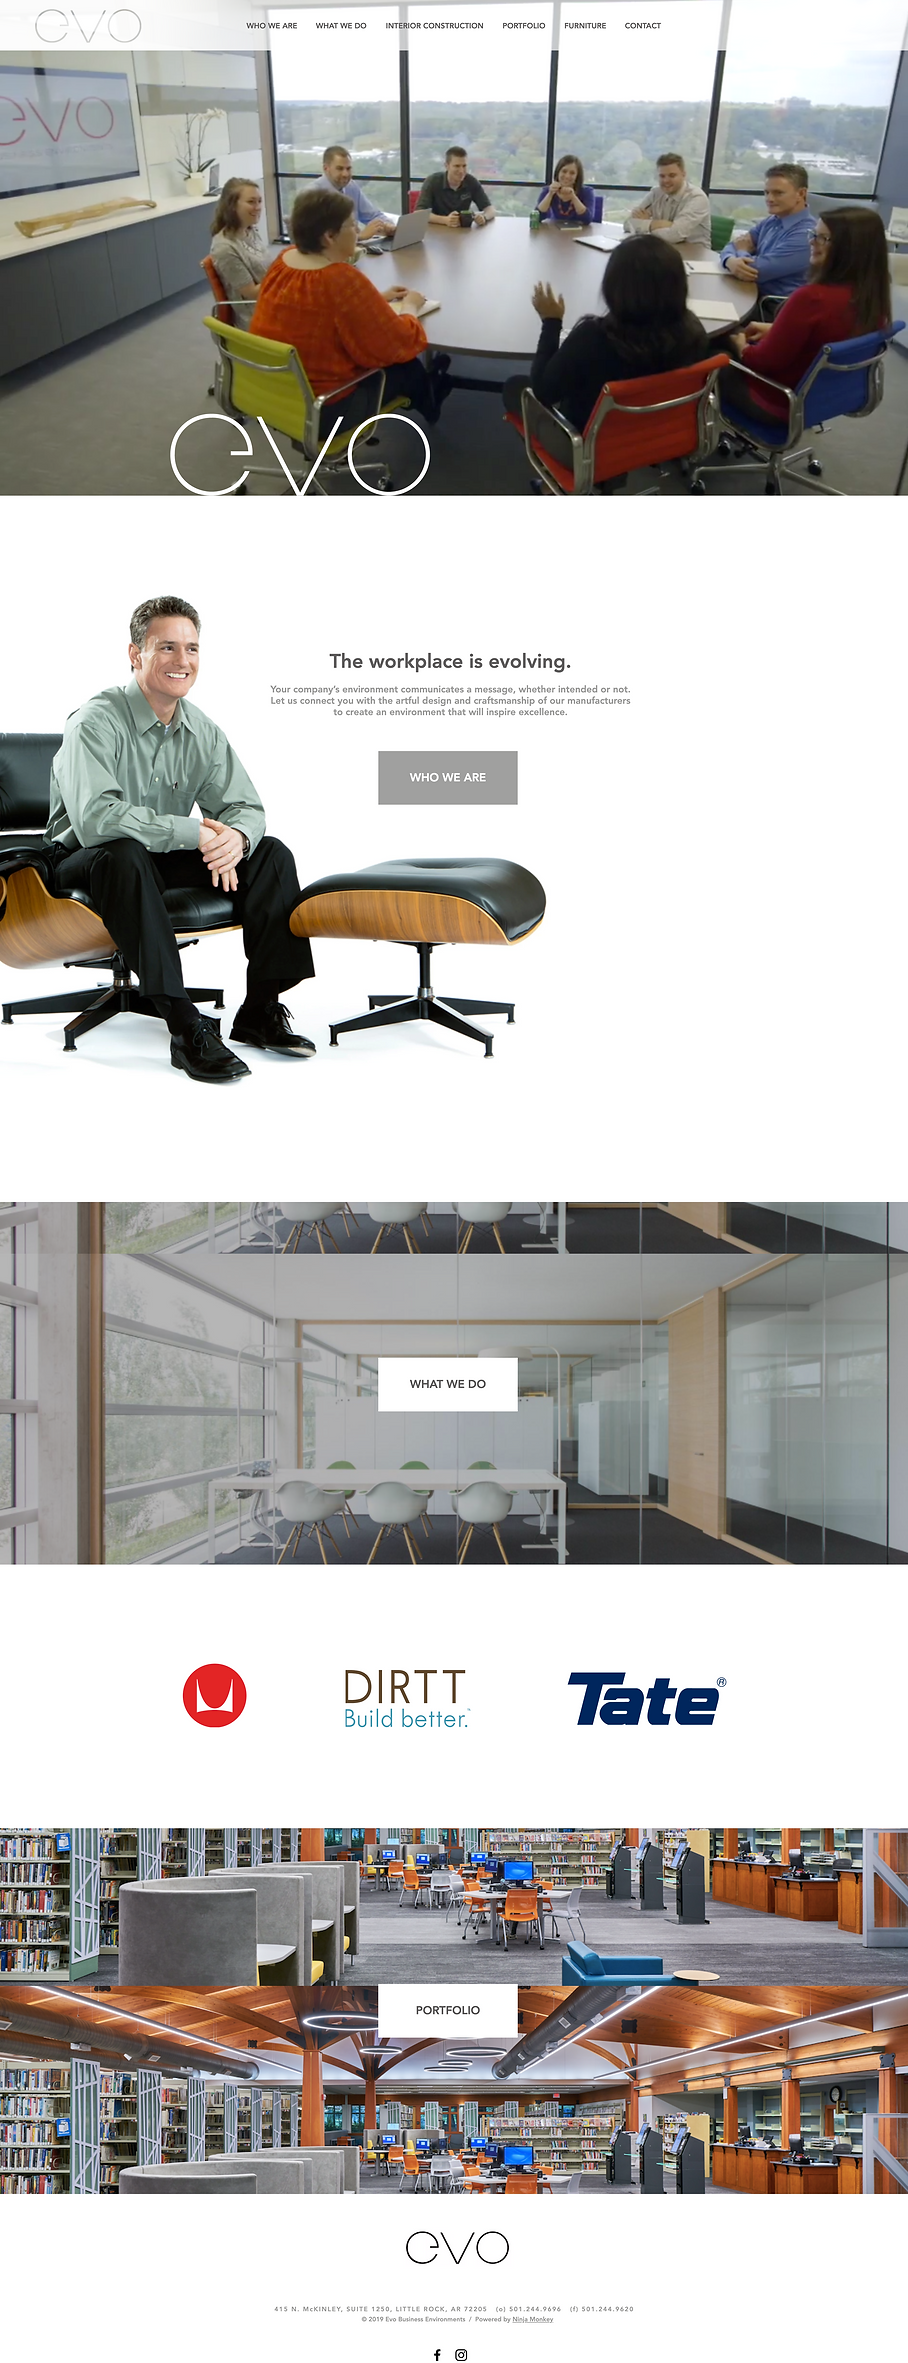 Ninja Monkey - Web Design & Marketing Asheville, NC